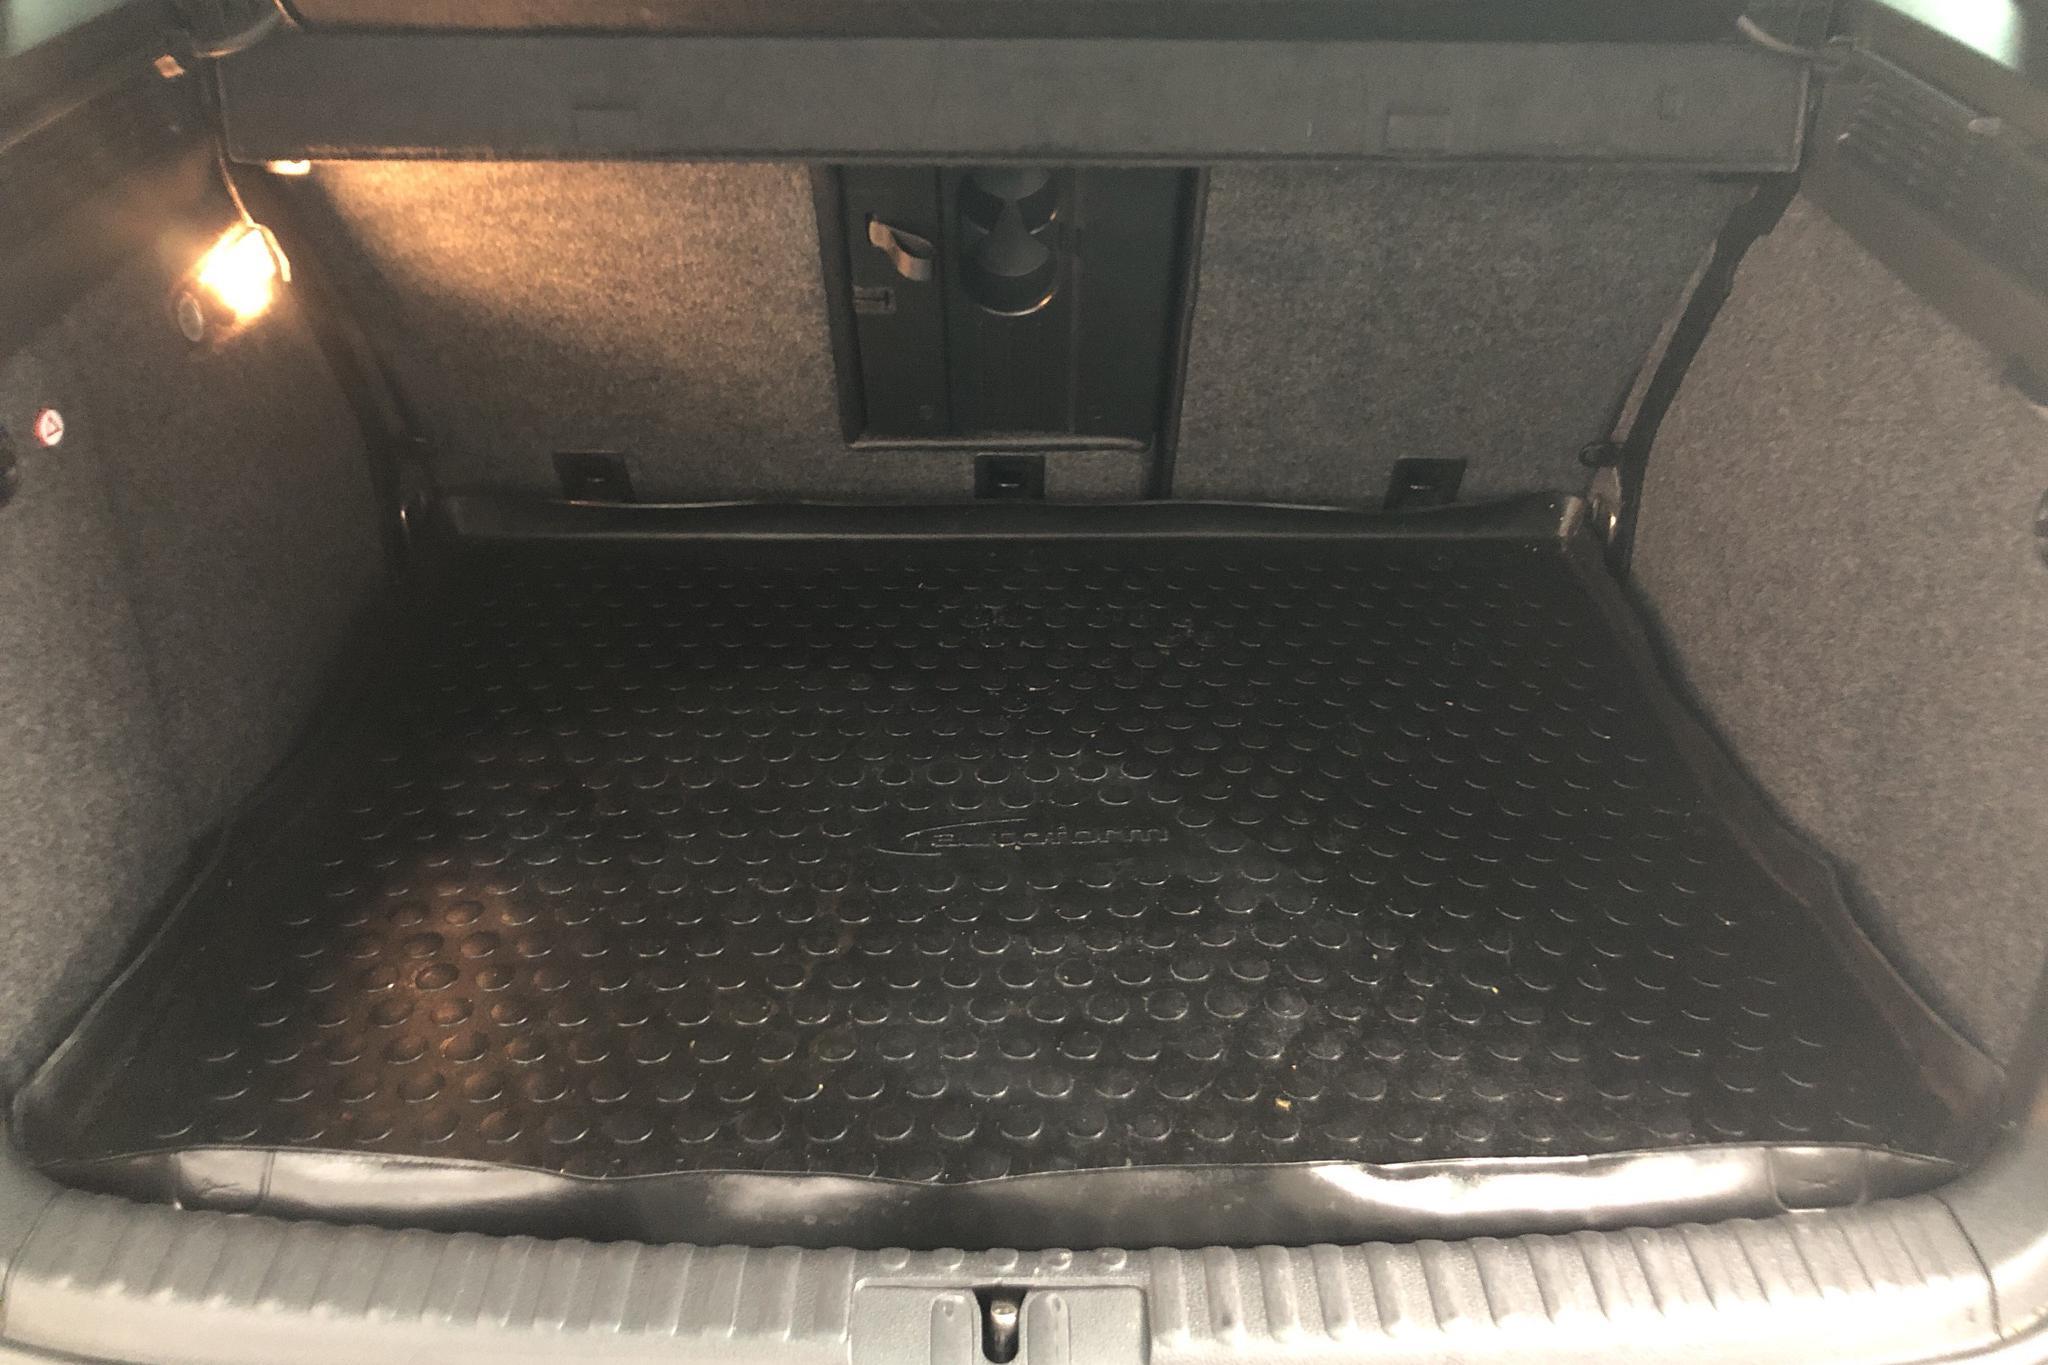 VW Tiguan 2.0 TDI 4MOTION BlueMotion Technology (184hk) - 17 566 mil - Automat - svart - 2016